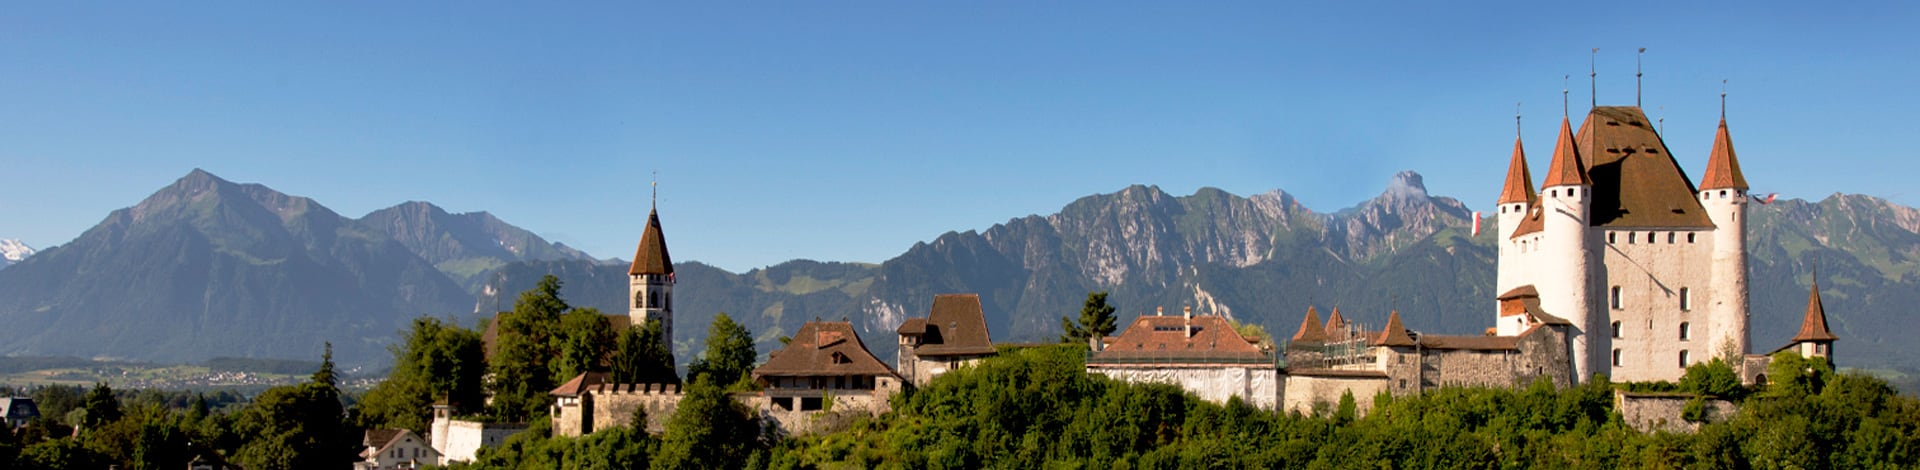 regione di Thun